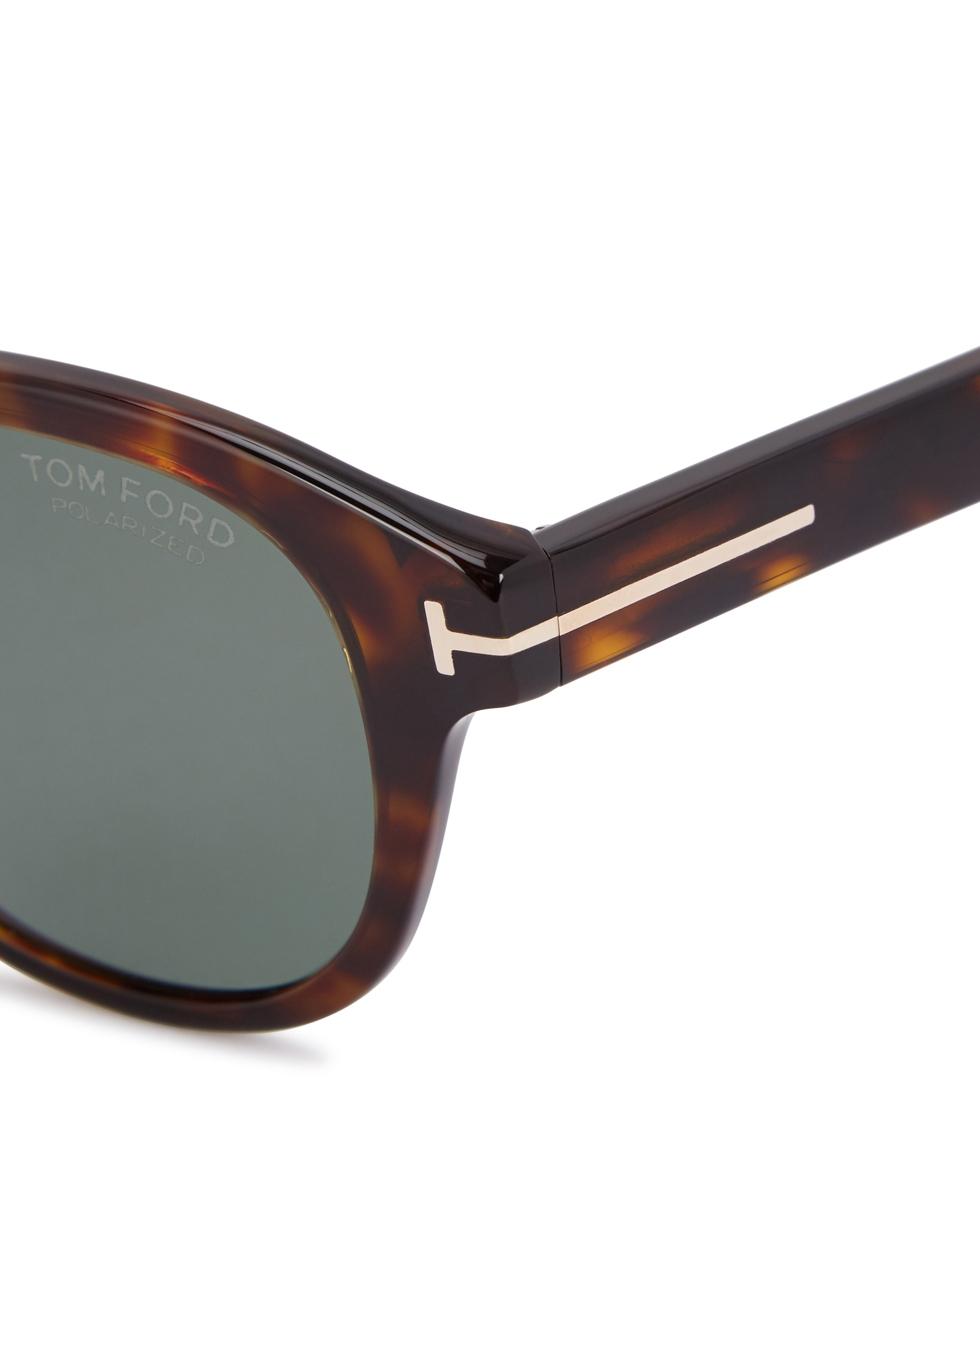 Von Bulow oval-frame sunglasses - Tom Ford Eyewear